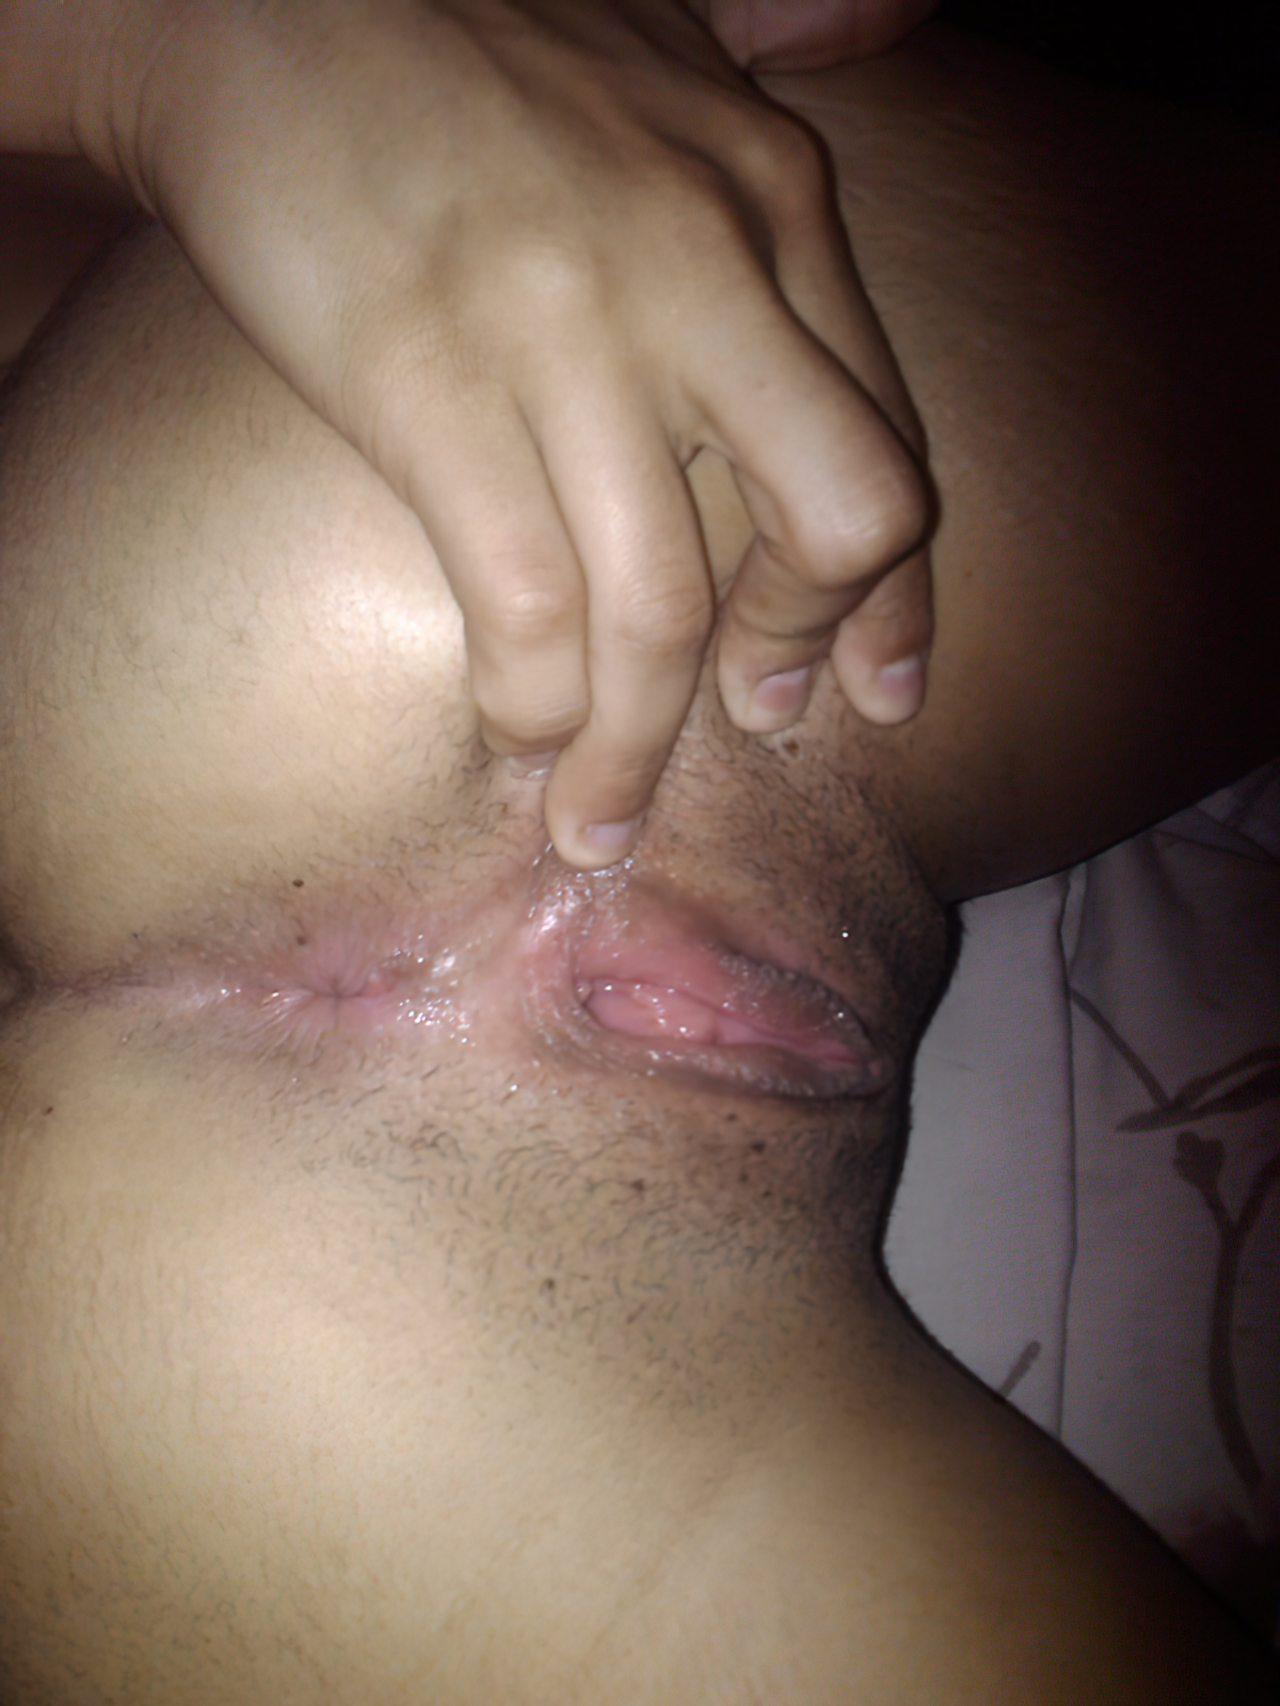 Bucetuda Malhada (14)